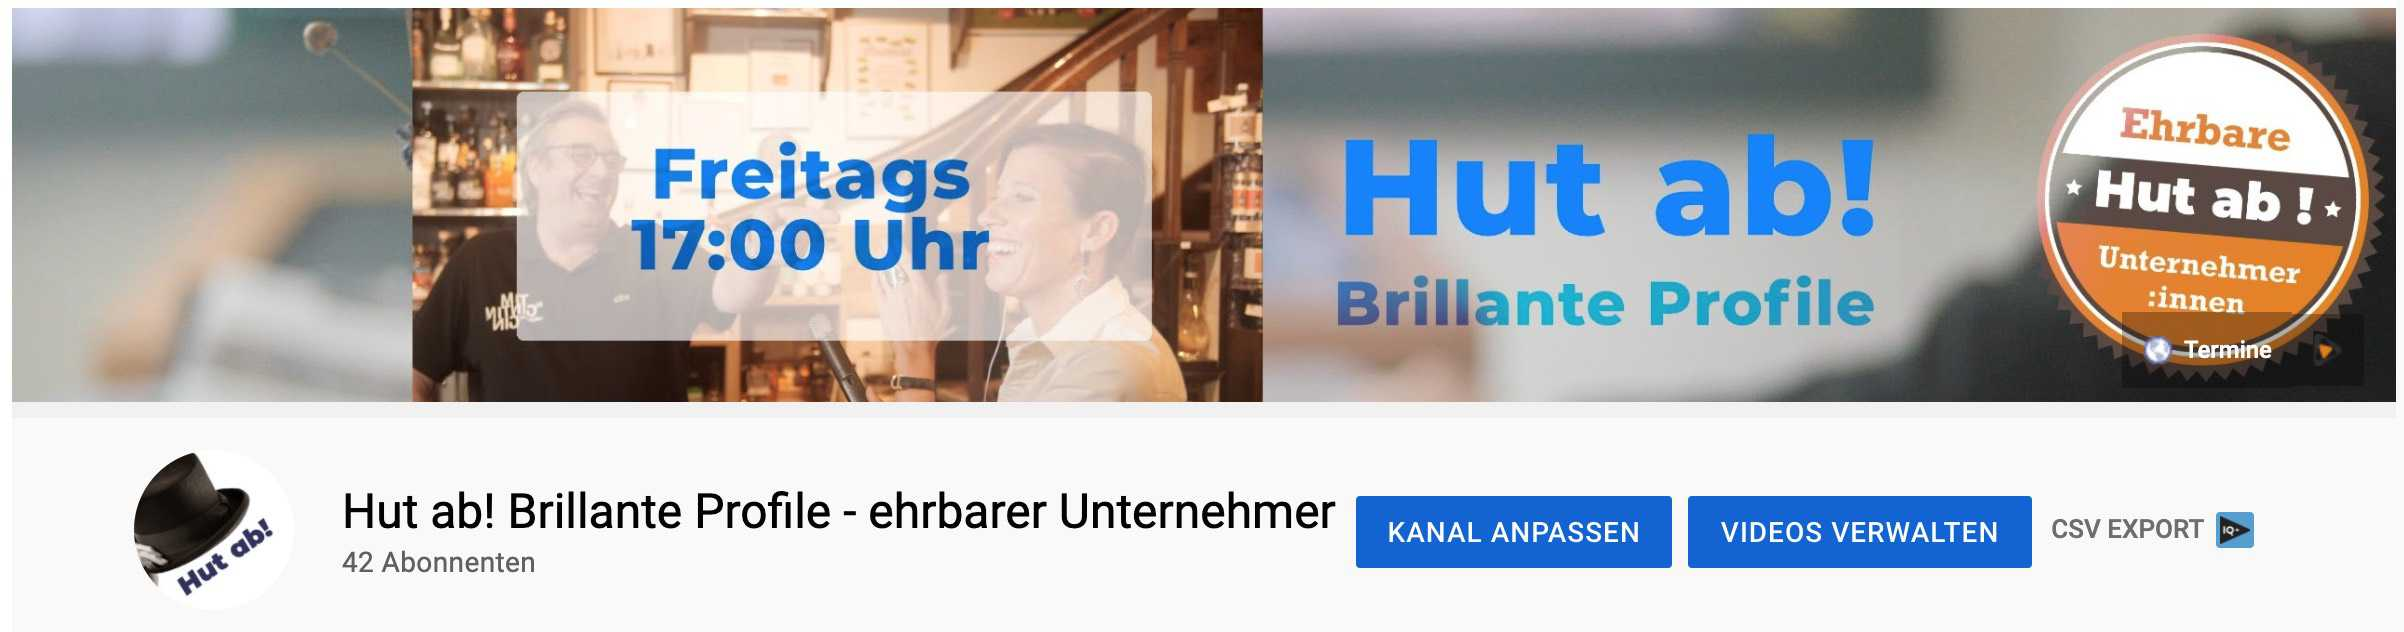 YouTube Kanal header